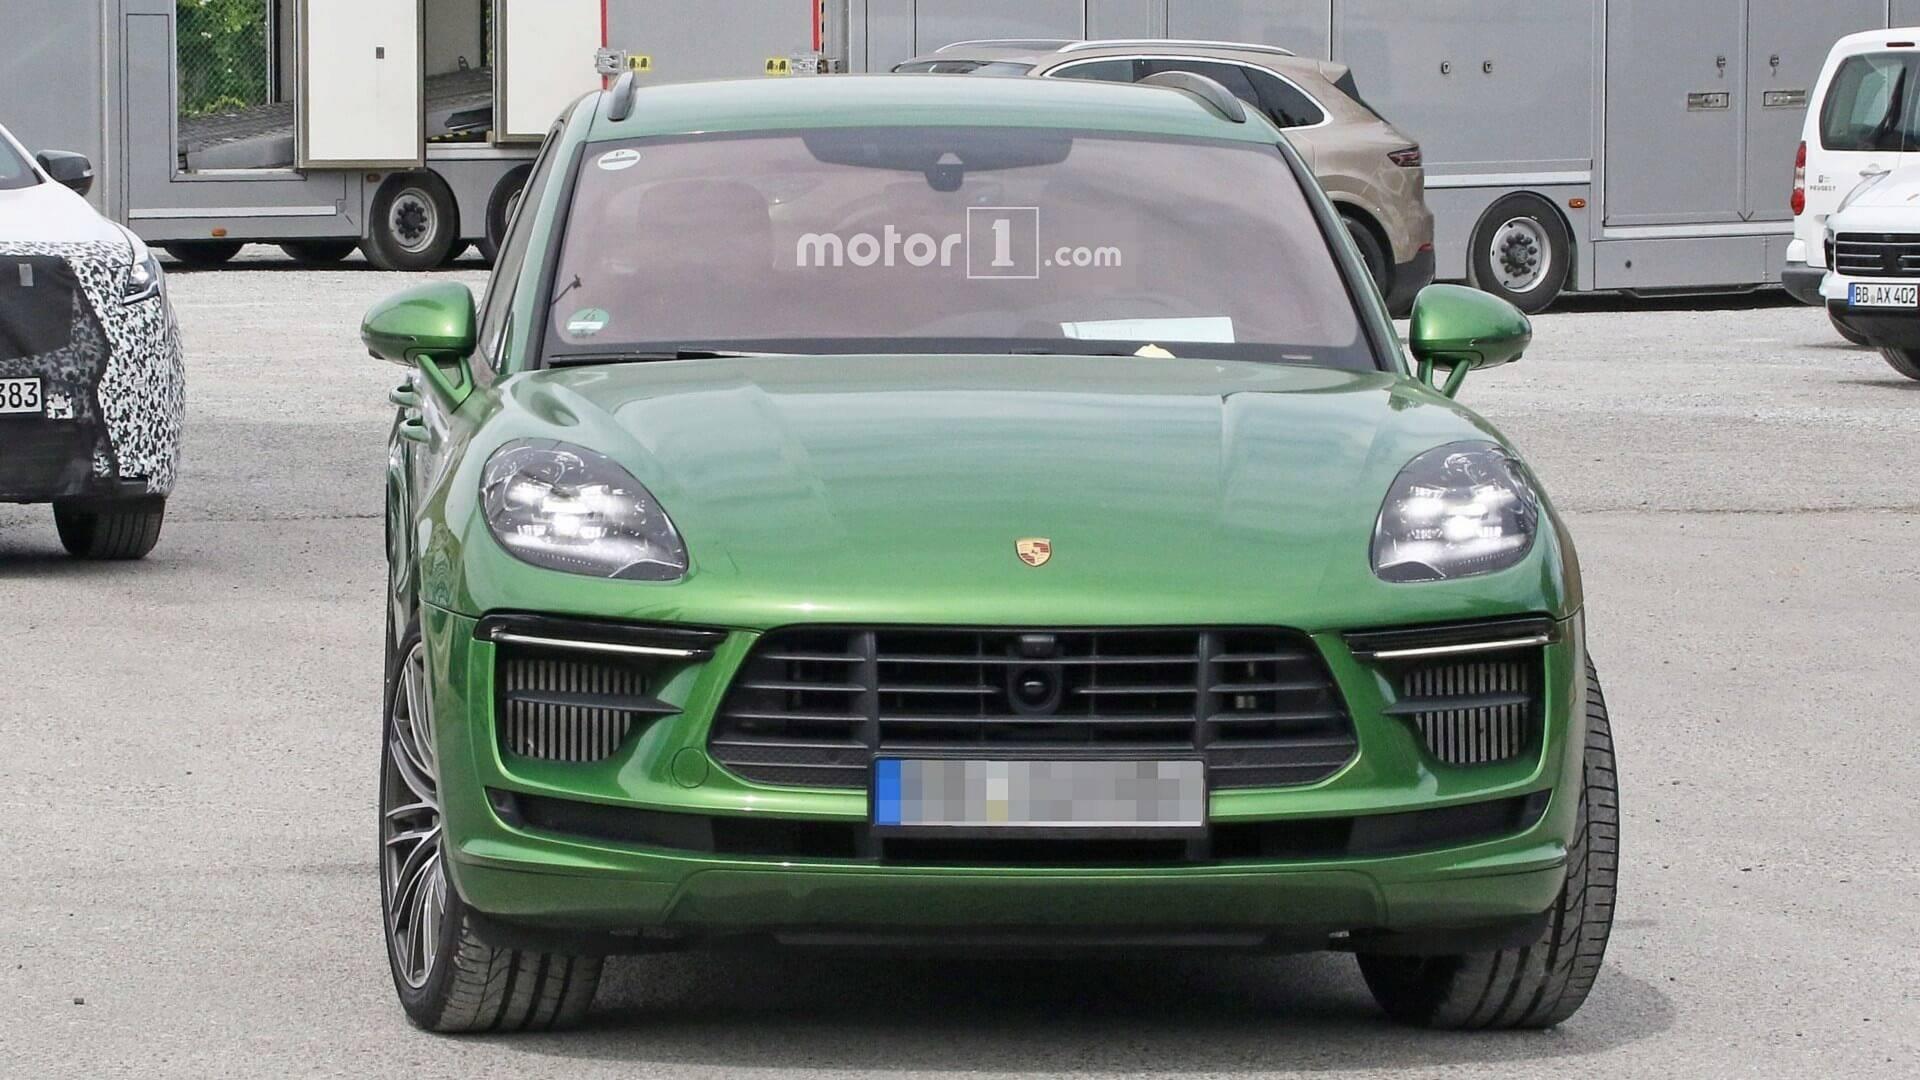 2018 - [Porsche] Macan Restylée [95B] - Page 3 2019-porsche-macan-turbo-facelift-spy-photo